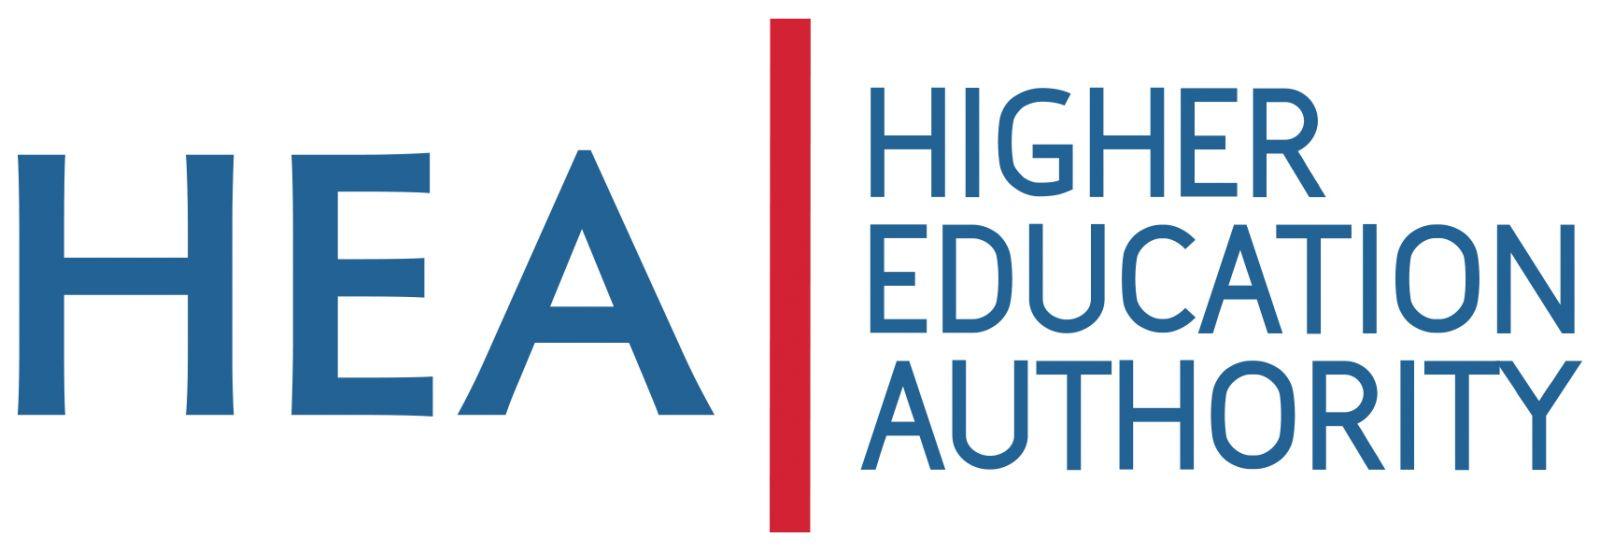 Higher Education Authority Logo